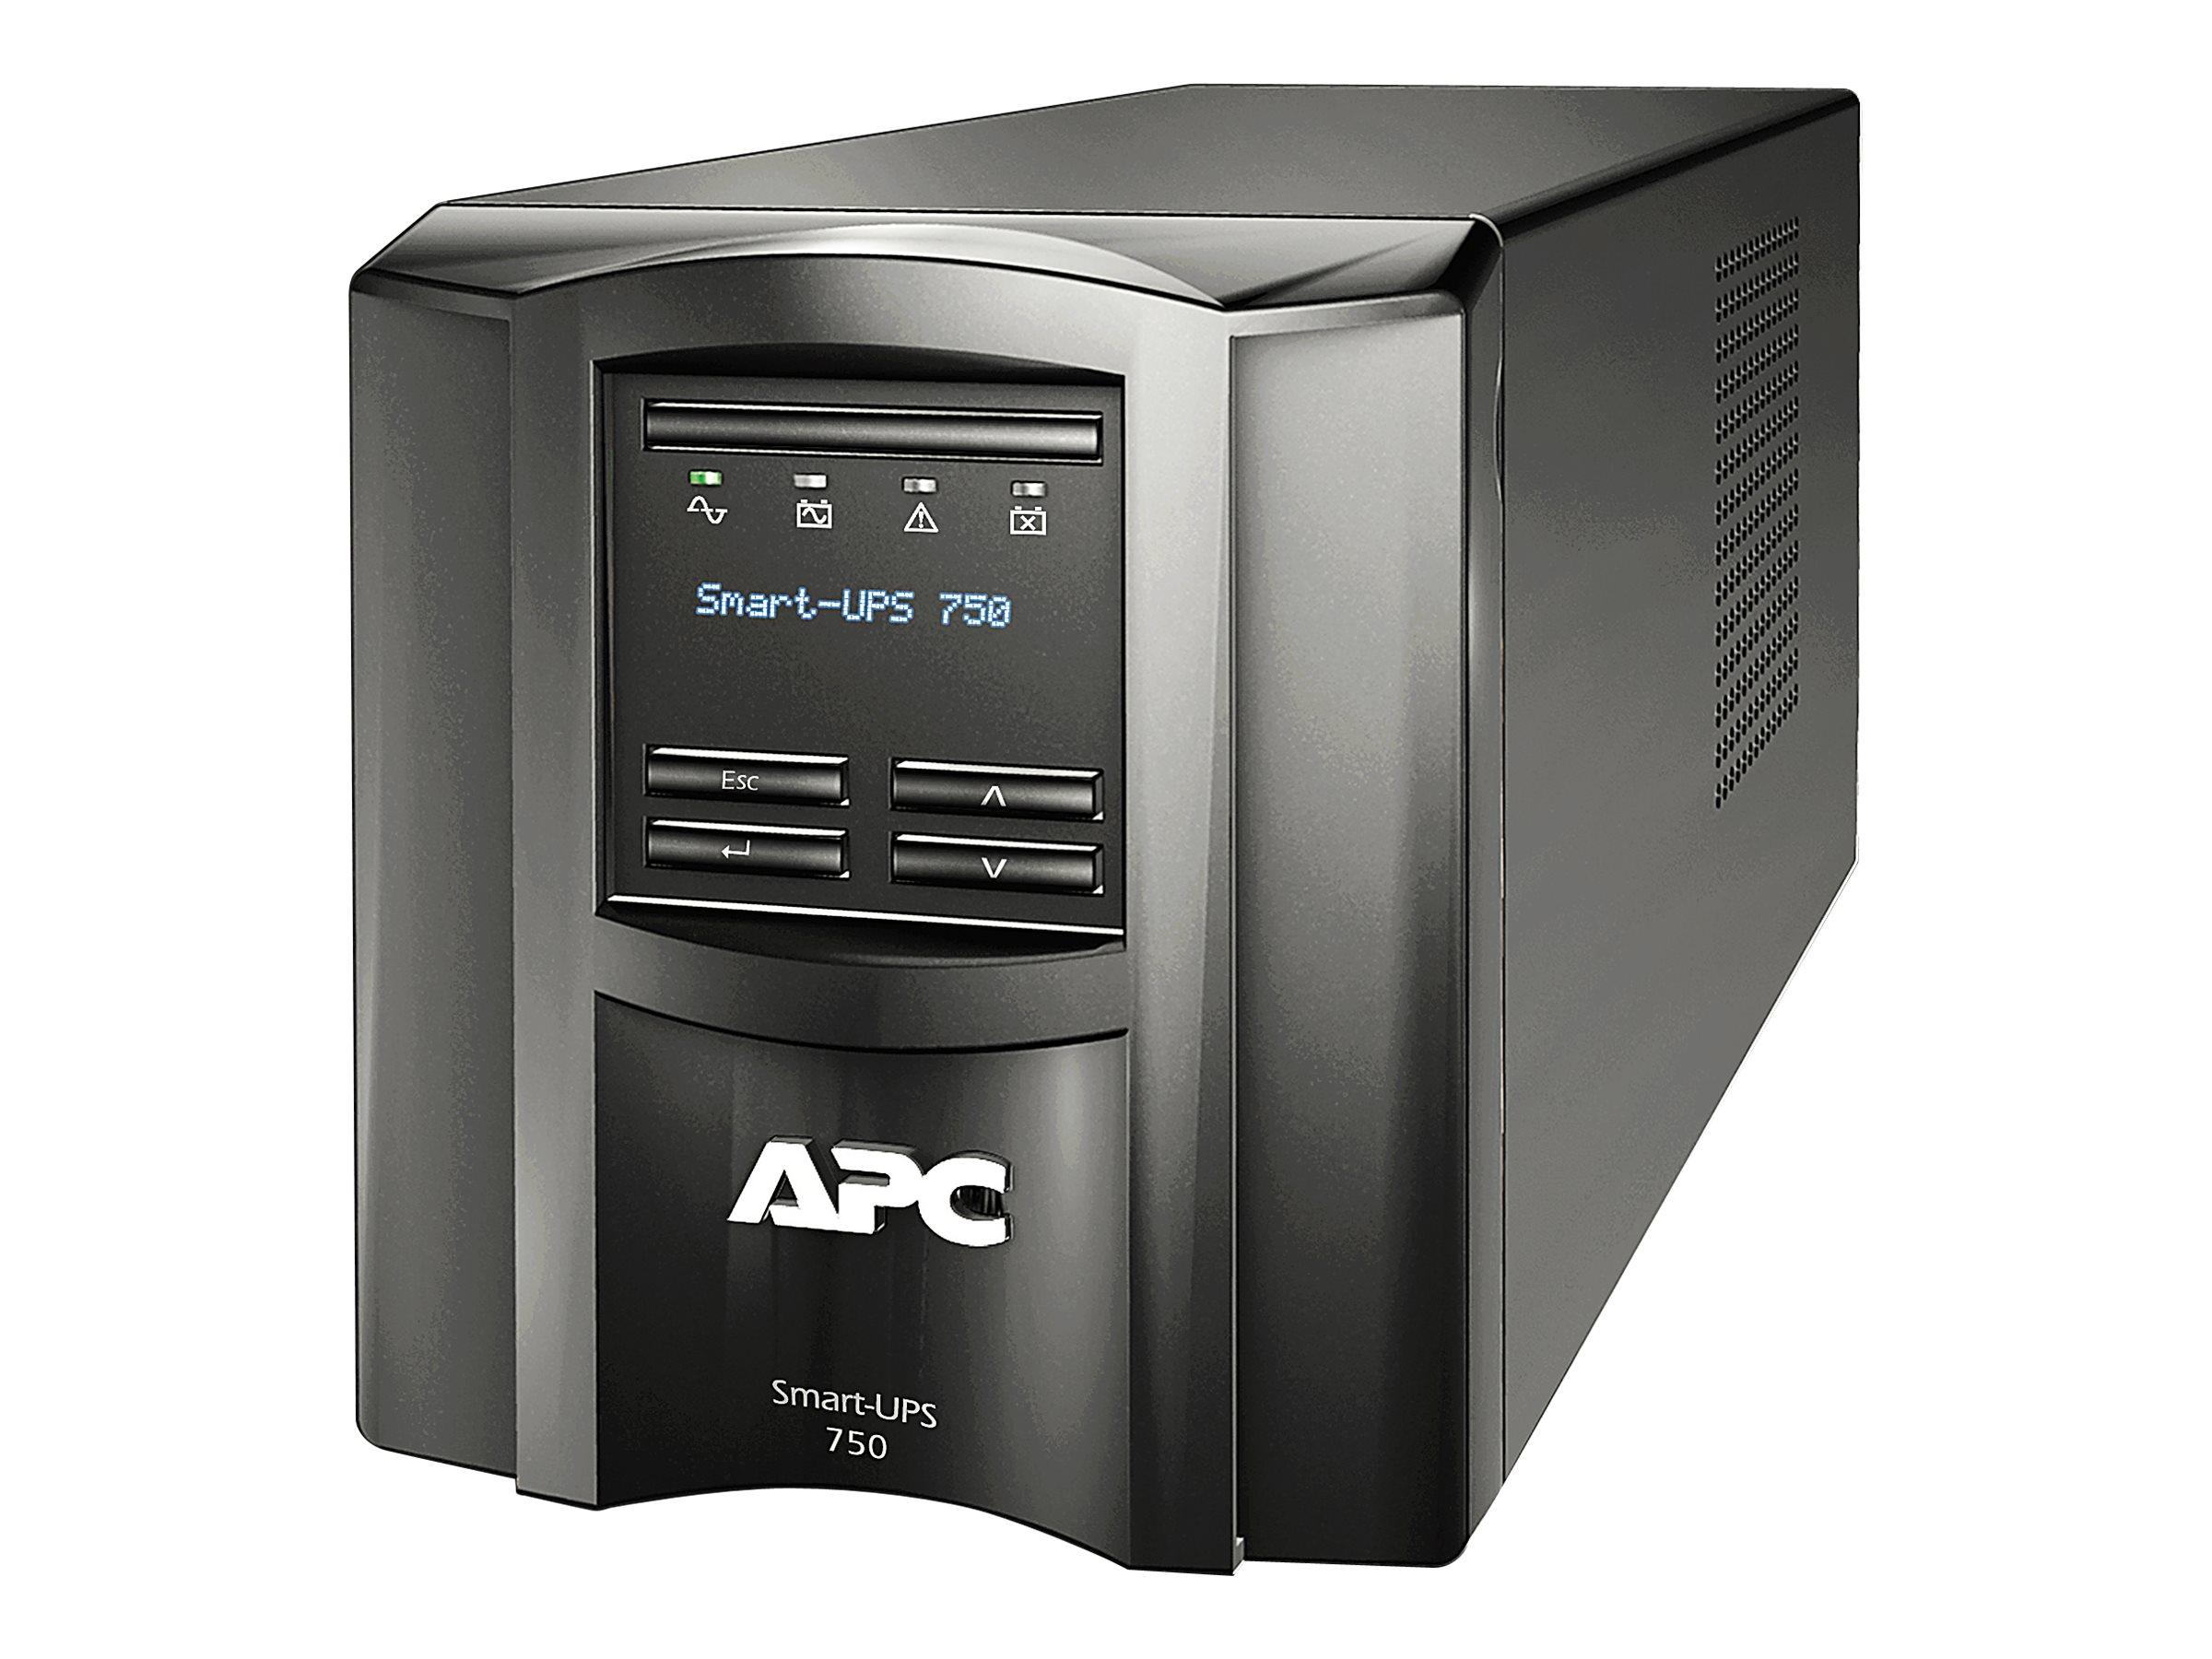 APC Smart-UPS SMT750IC - USV - Wechselstrom 220/230/240 V